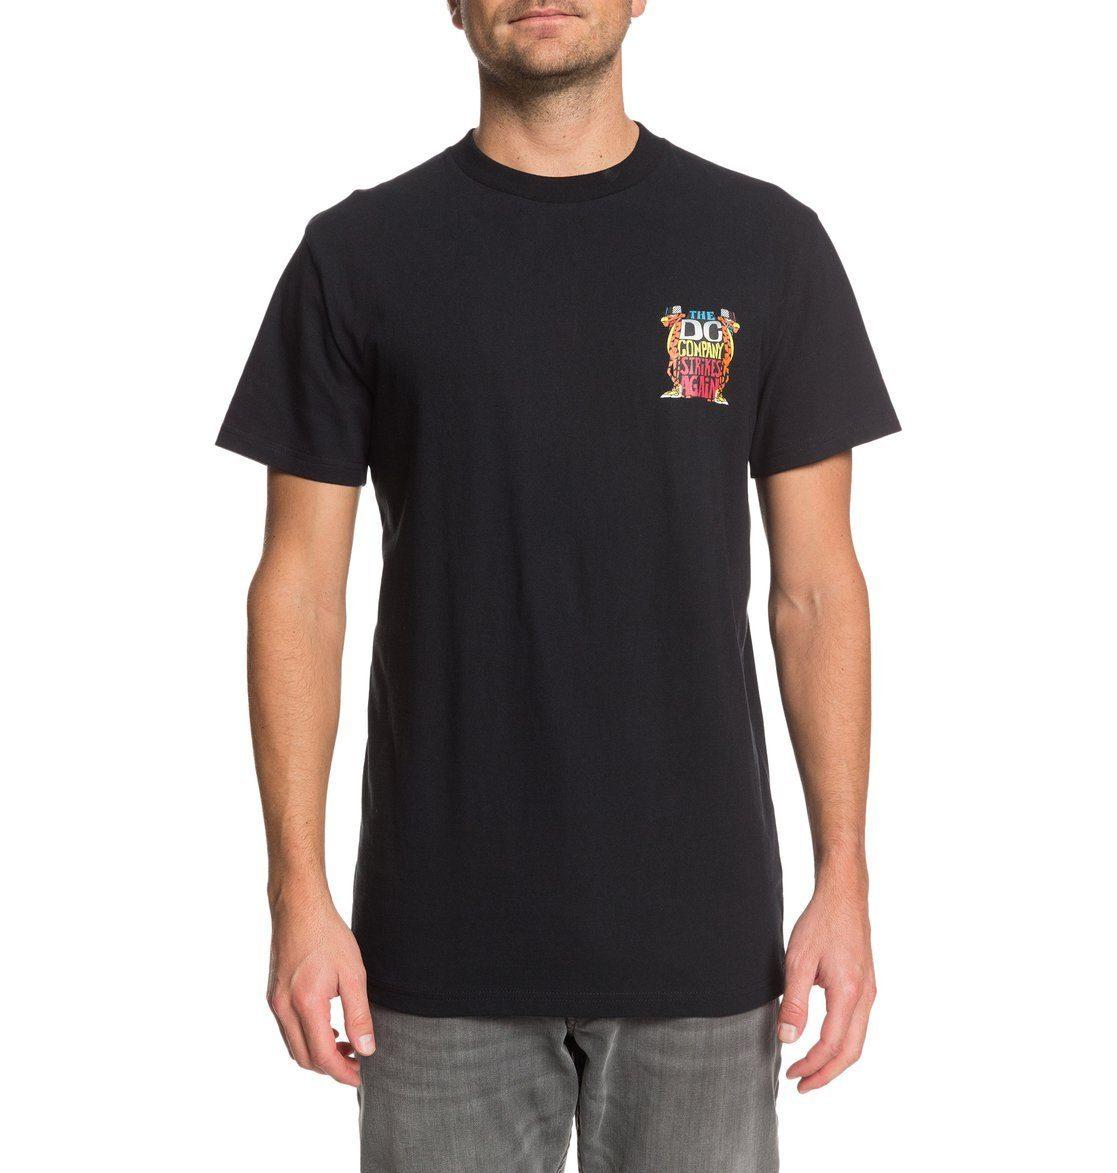 MALIBU 61 Purple  /& White Short Sleeve T-Shirt KEN Casual Shirt Genuine BARBIE